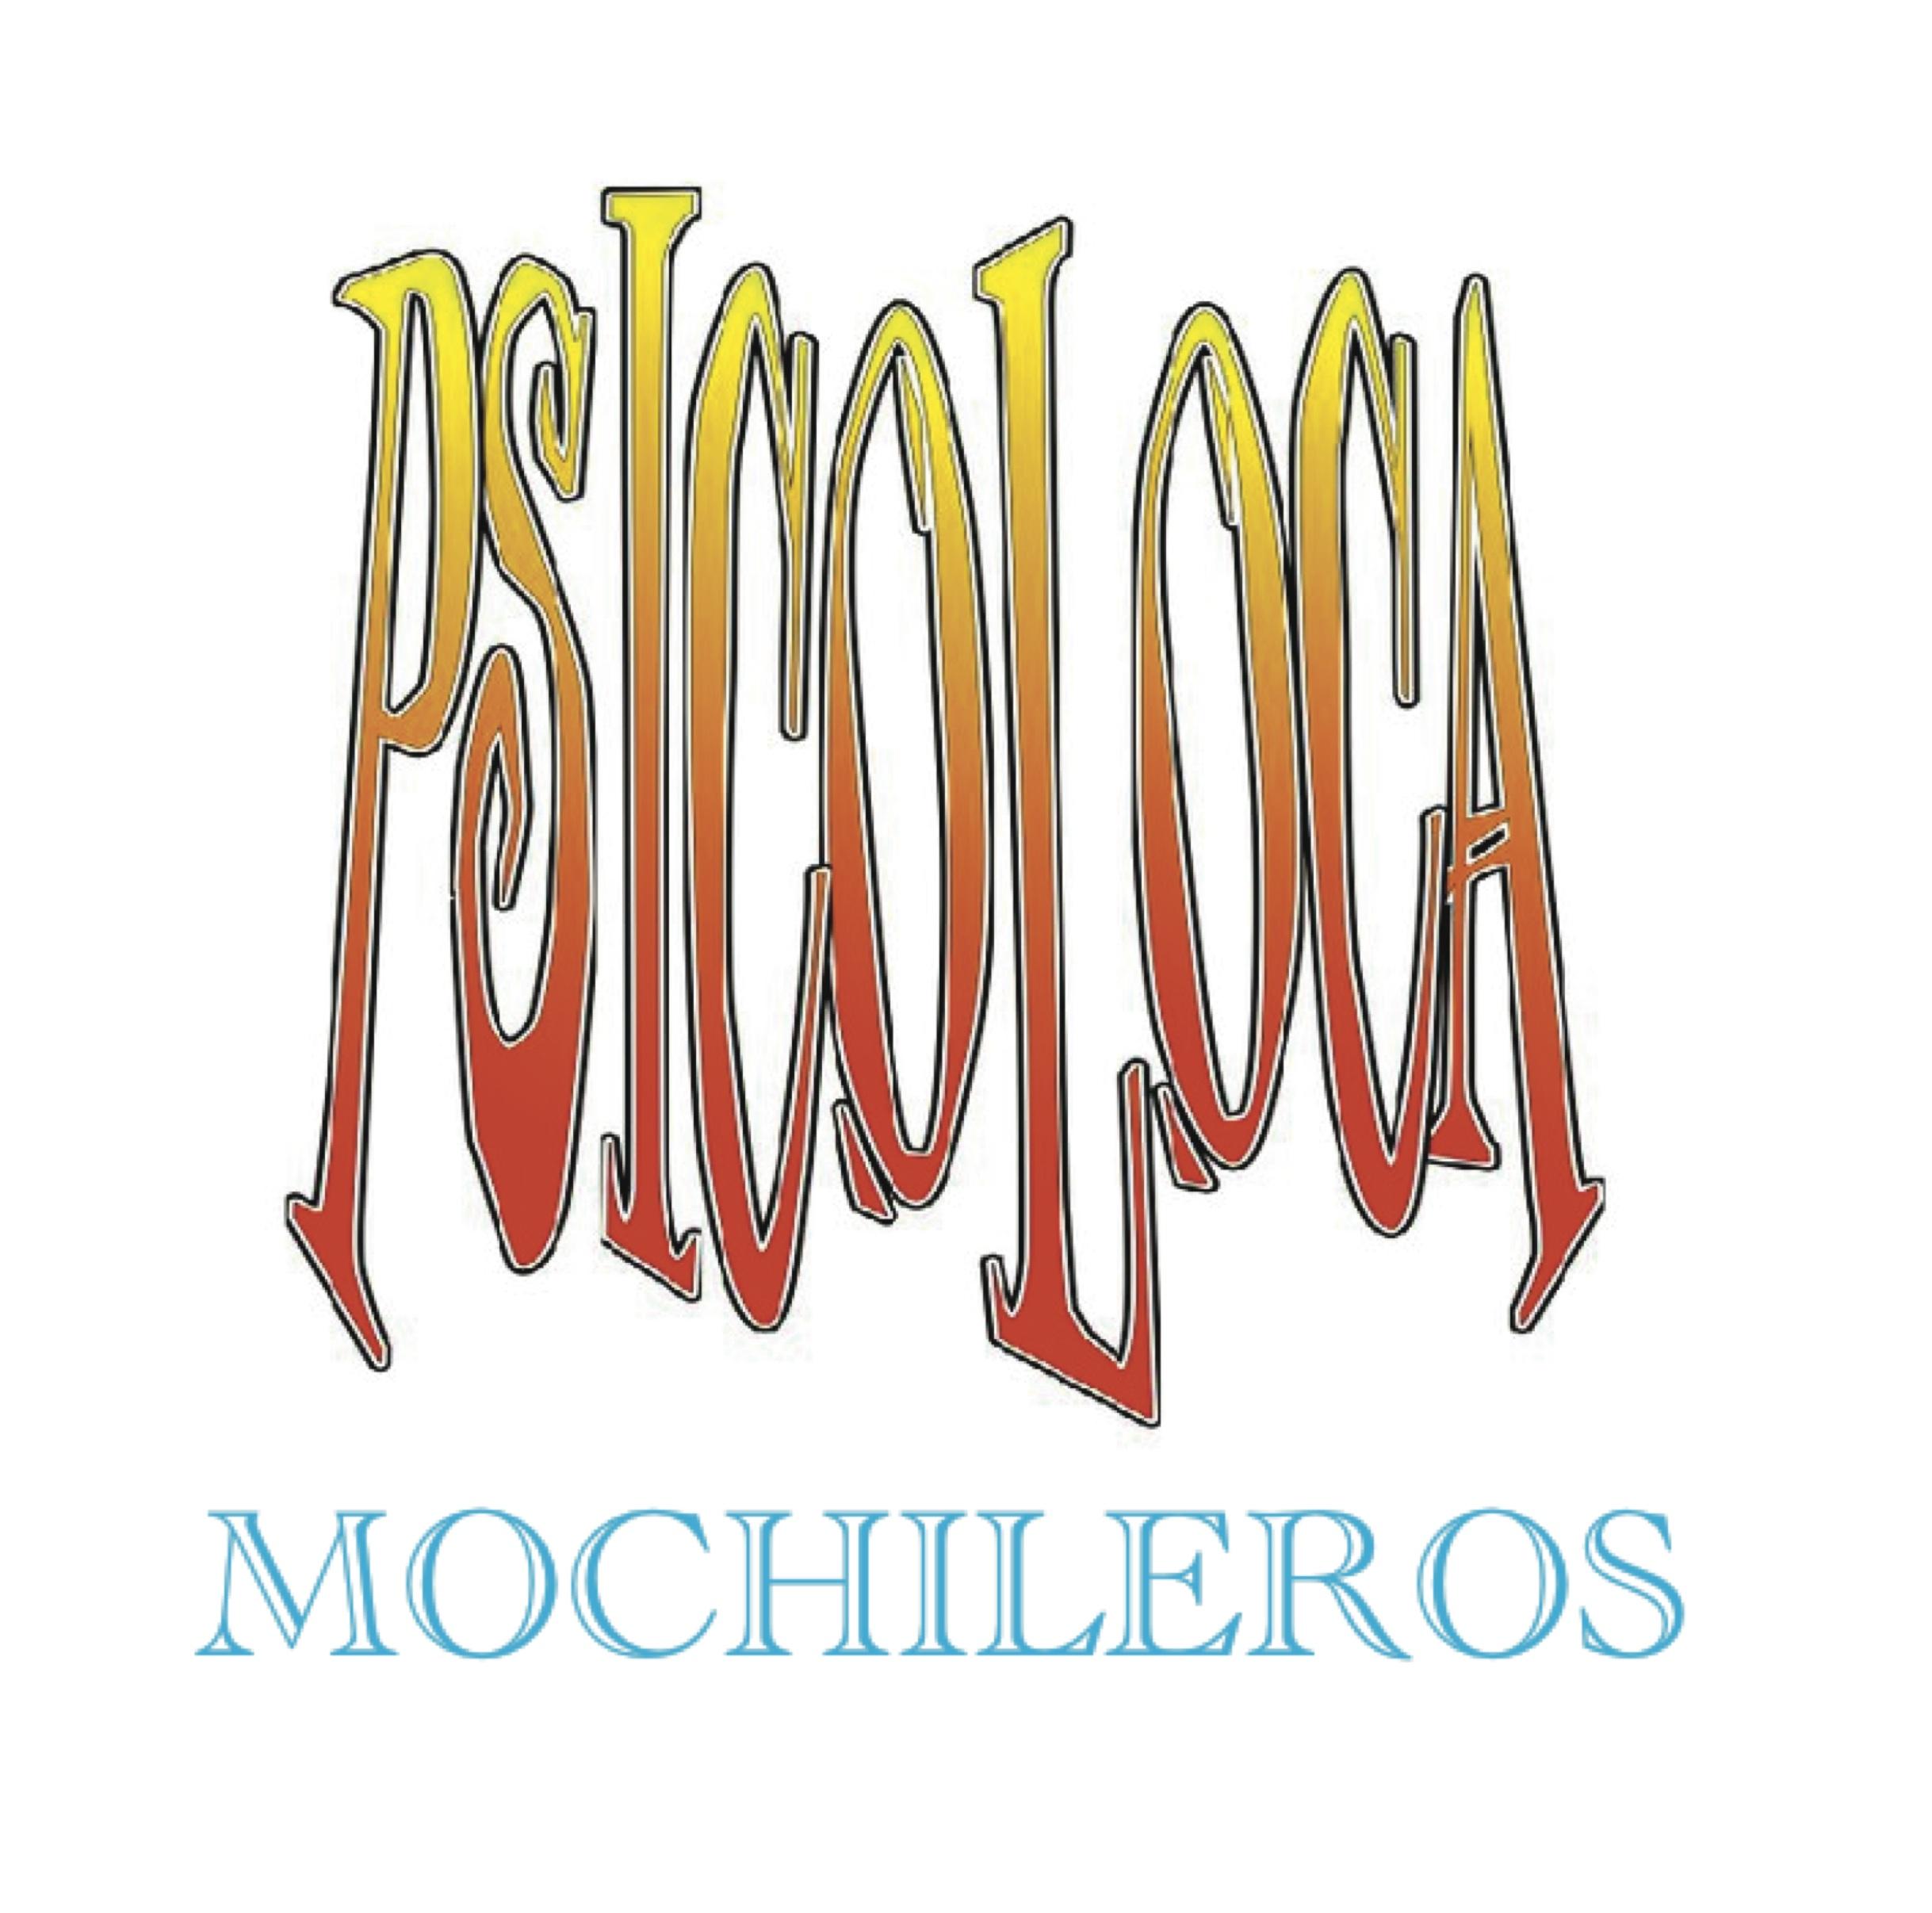 PSICOLOCA MOCHILEROS SINGLE